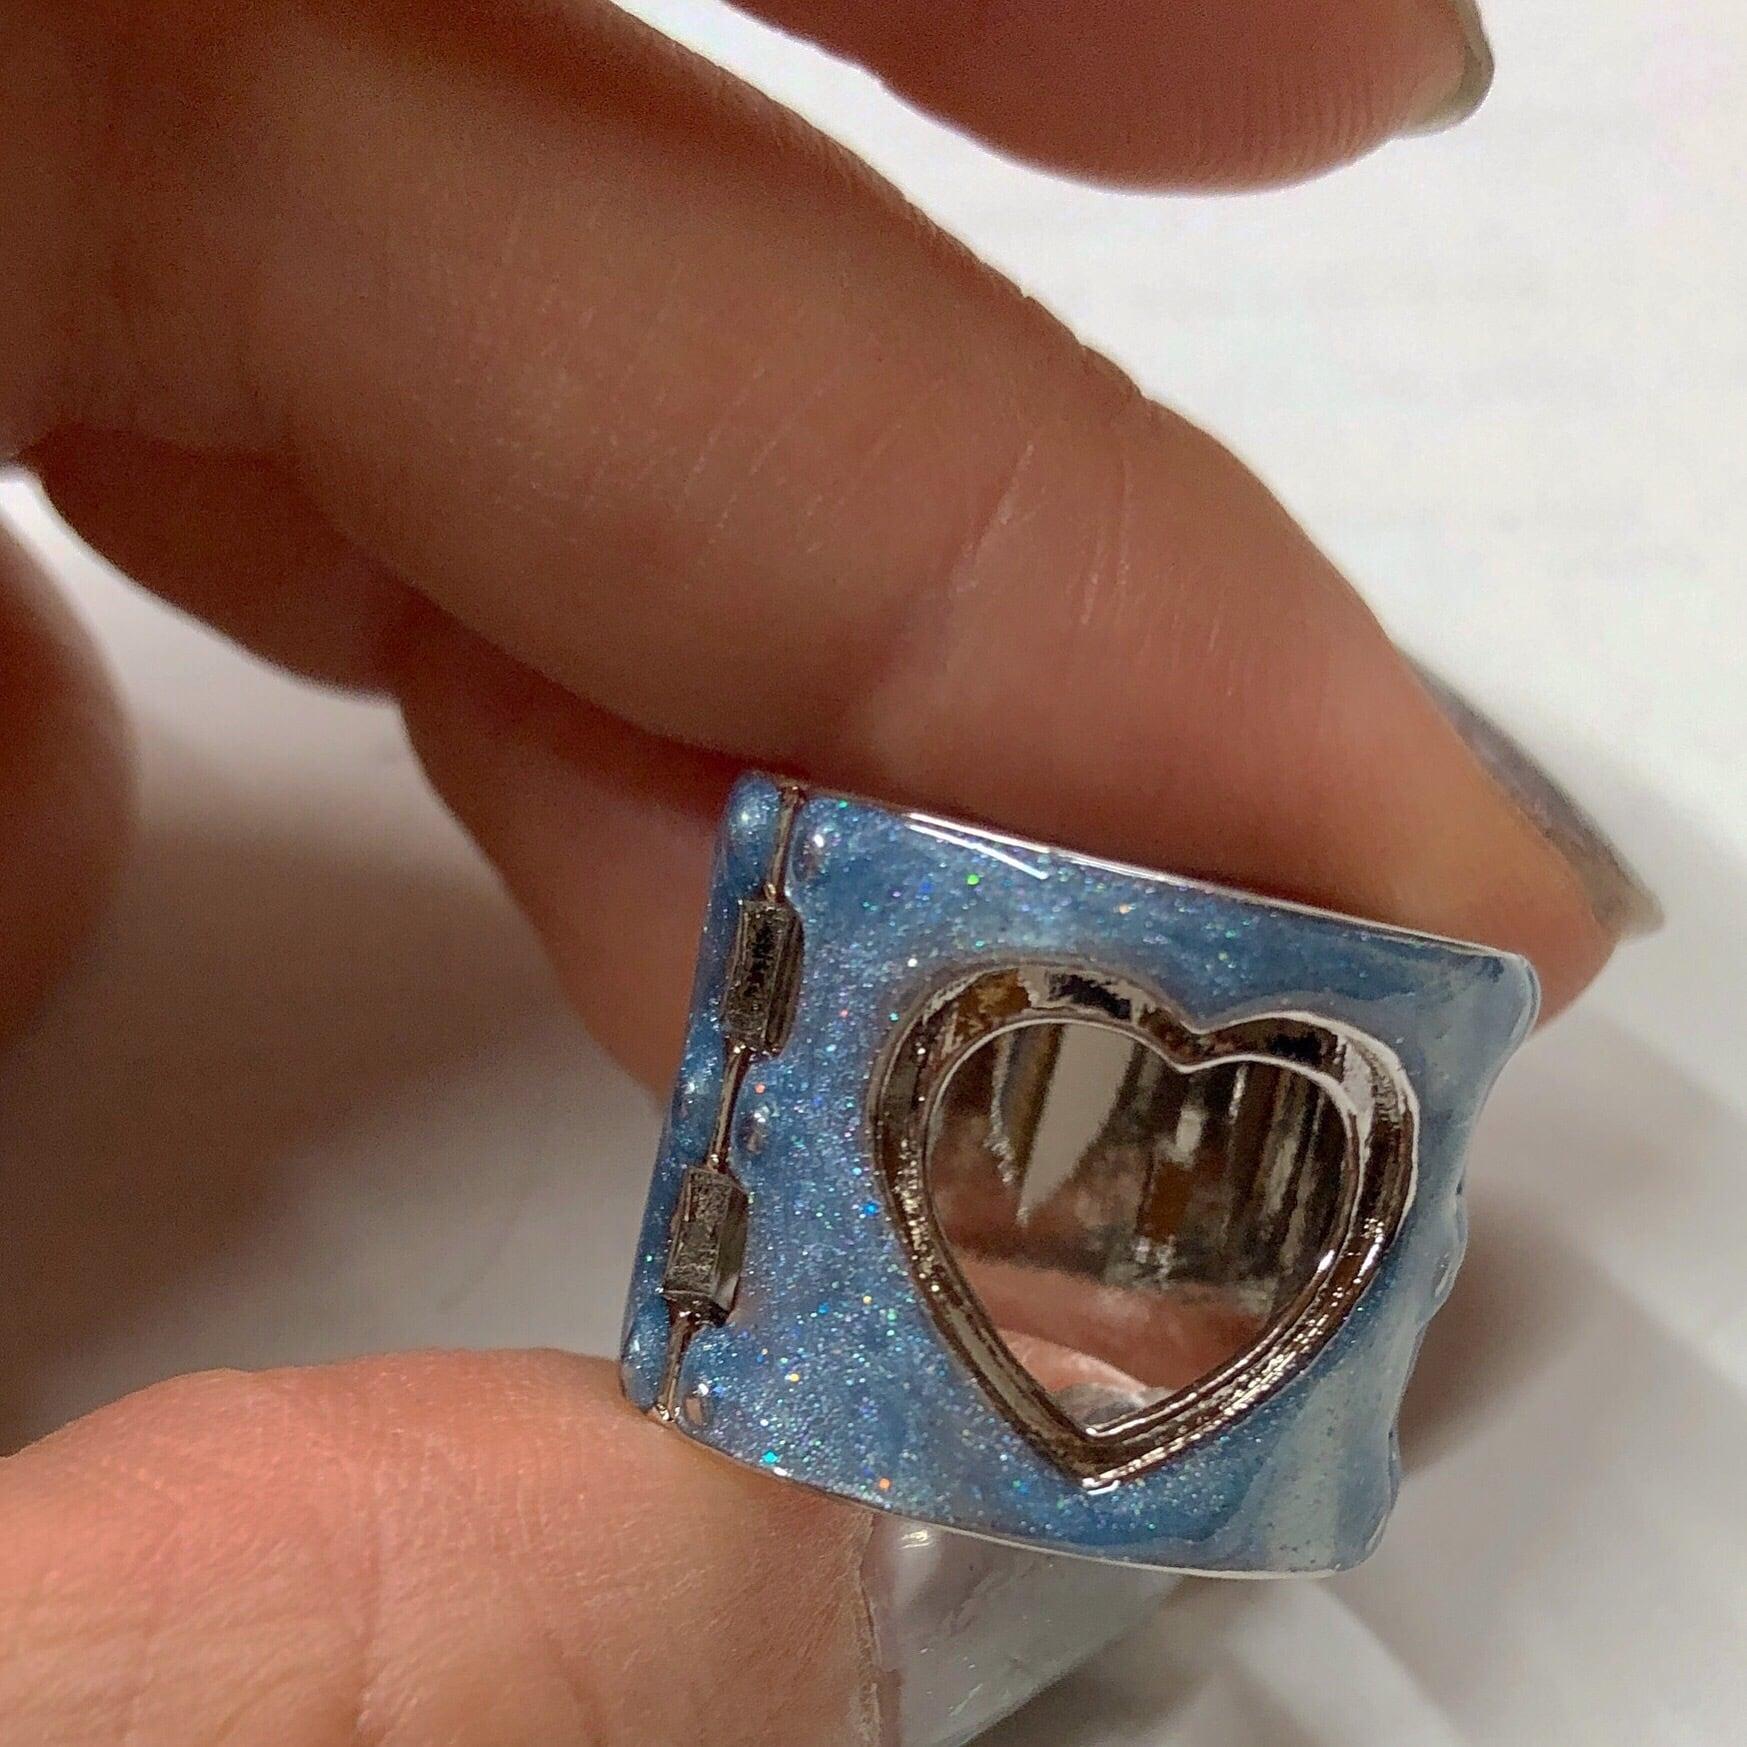 handcuffs RING SILVER BLUE #LA19002R ハンドカフスリング/シルバー・ブルー